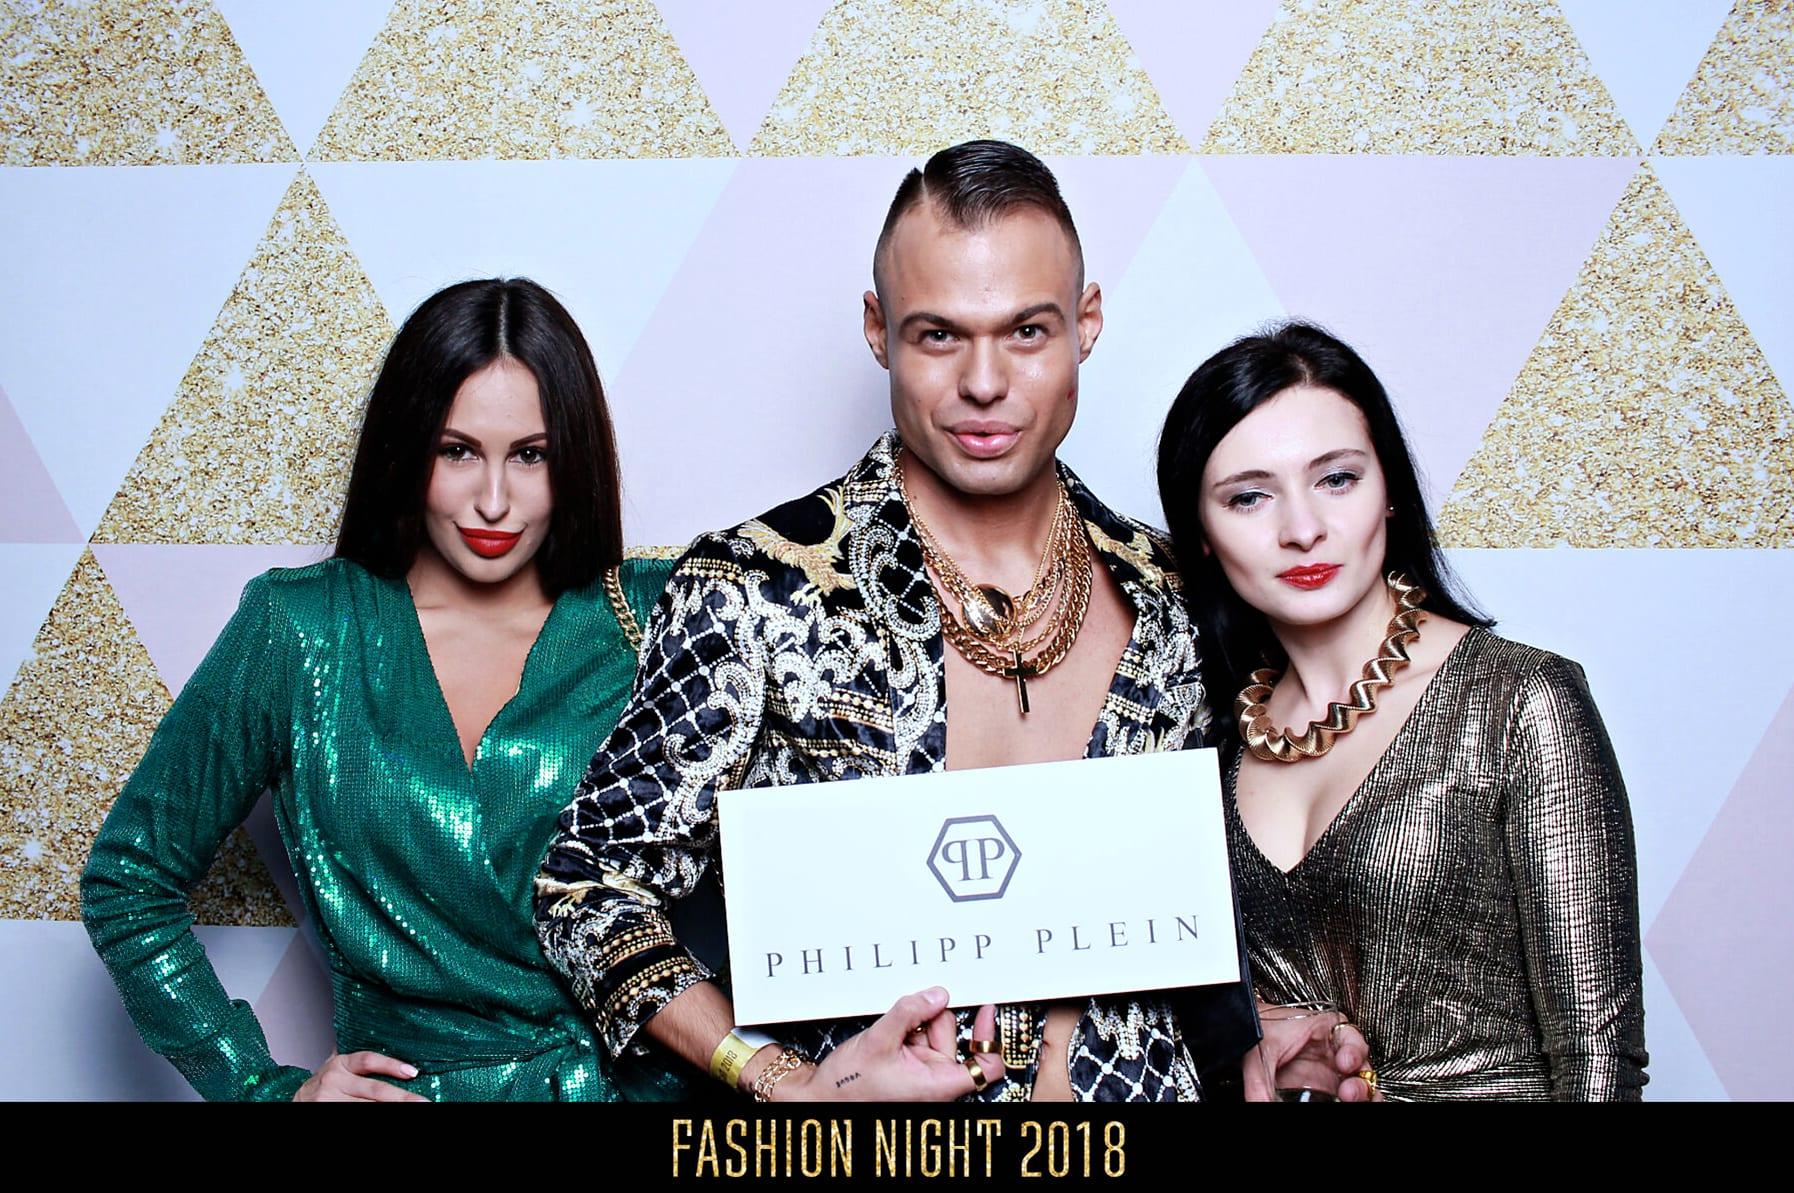 fotokoutek-fashion-night-13-12-2018-546801